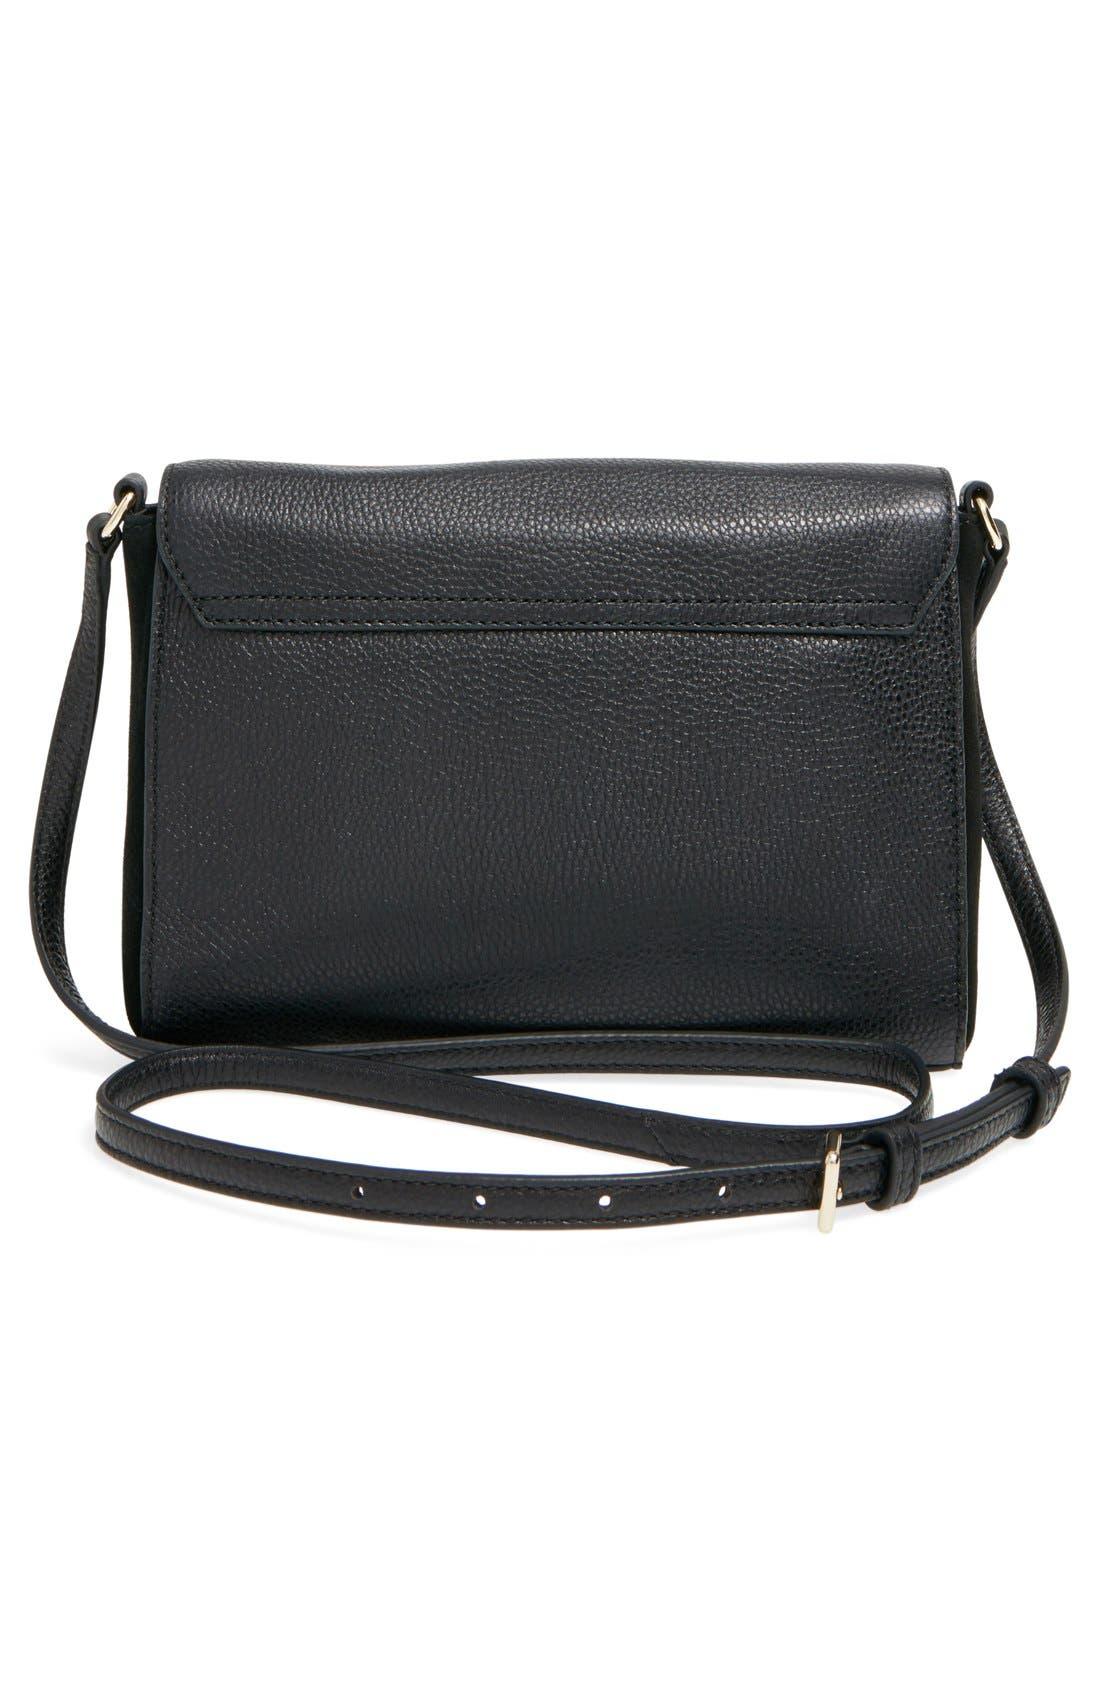 Alternate Image 3  - kate spade new york 'matthews drive - patty' leather & suede crossbody bag